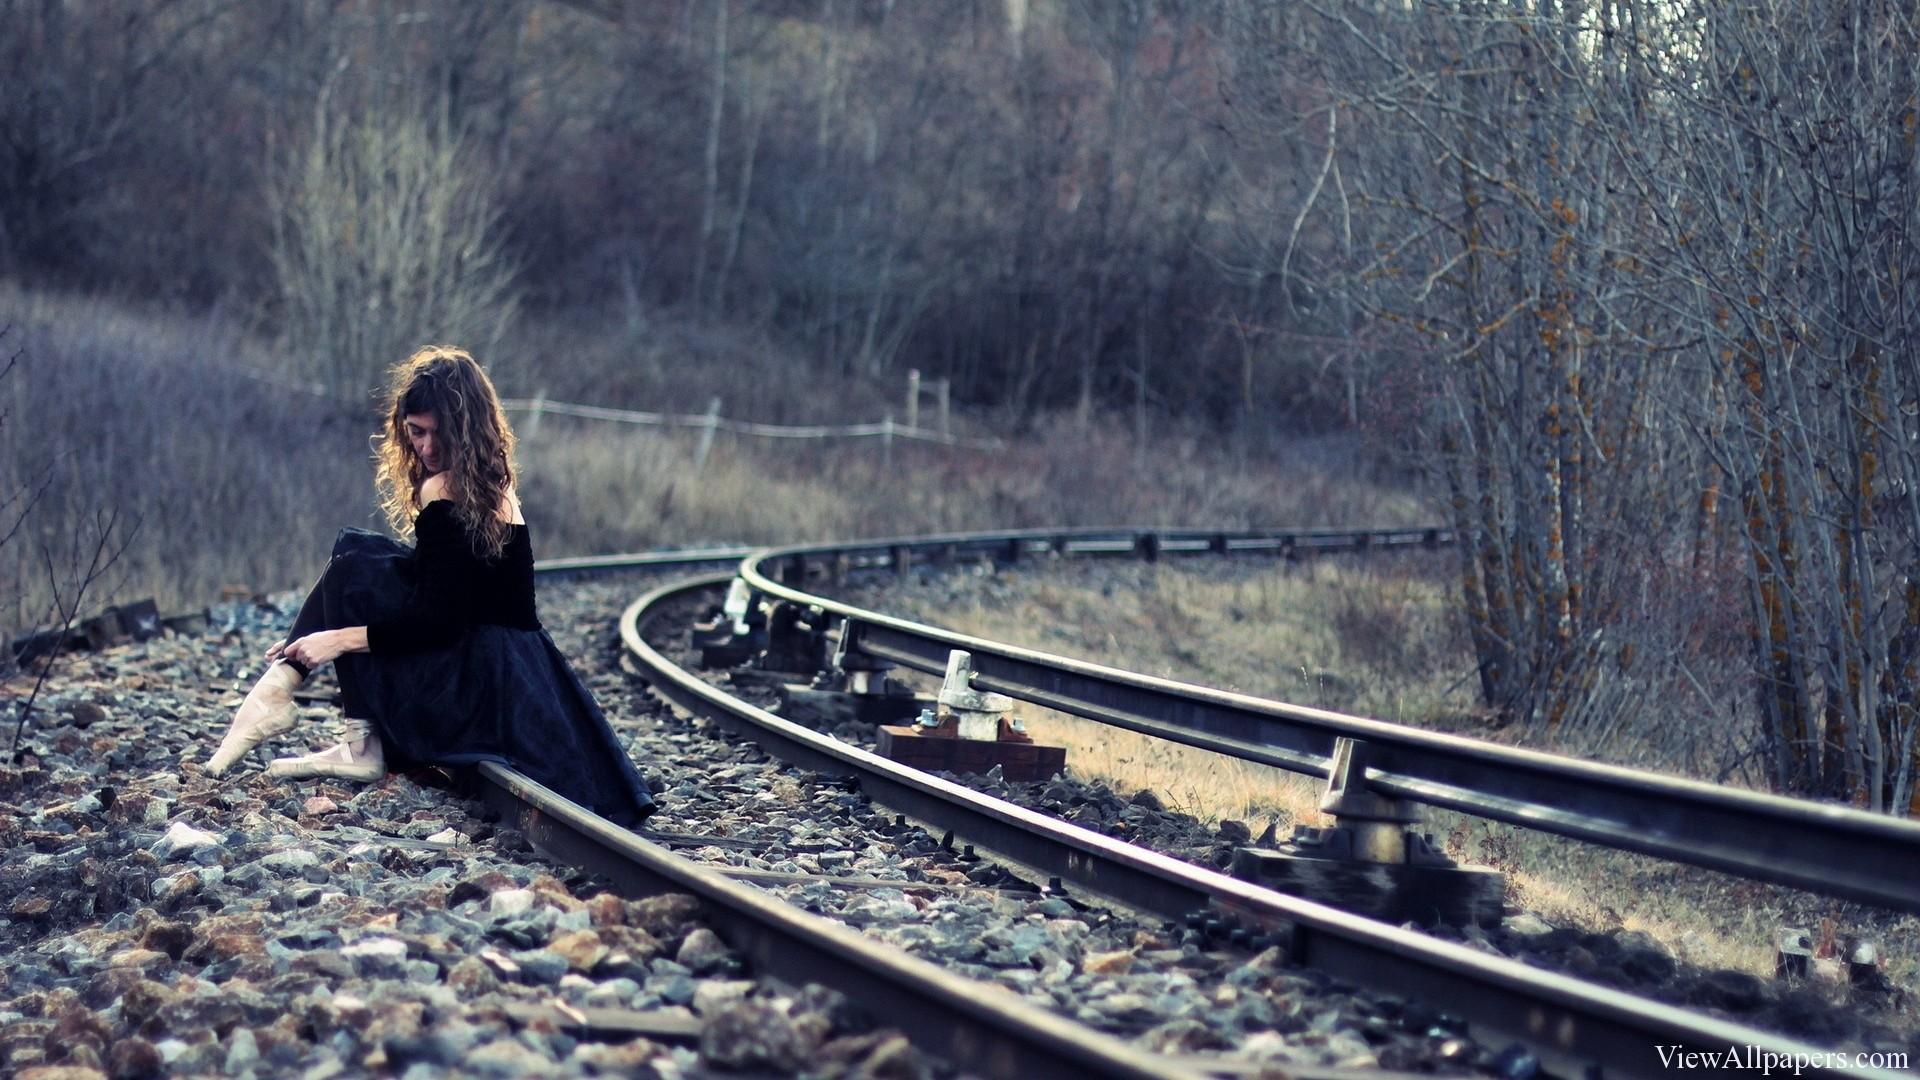 Girl Sitting On Railway Tracks